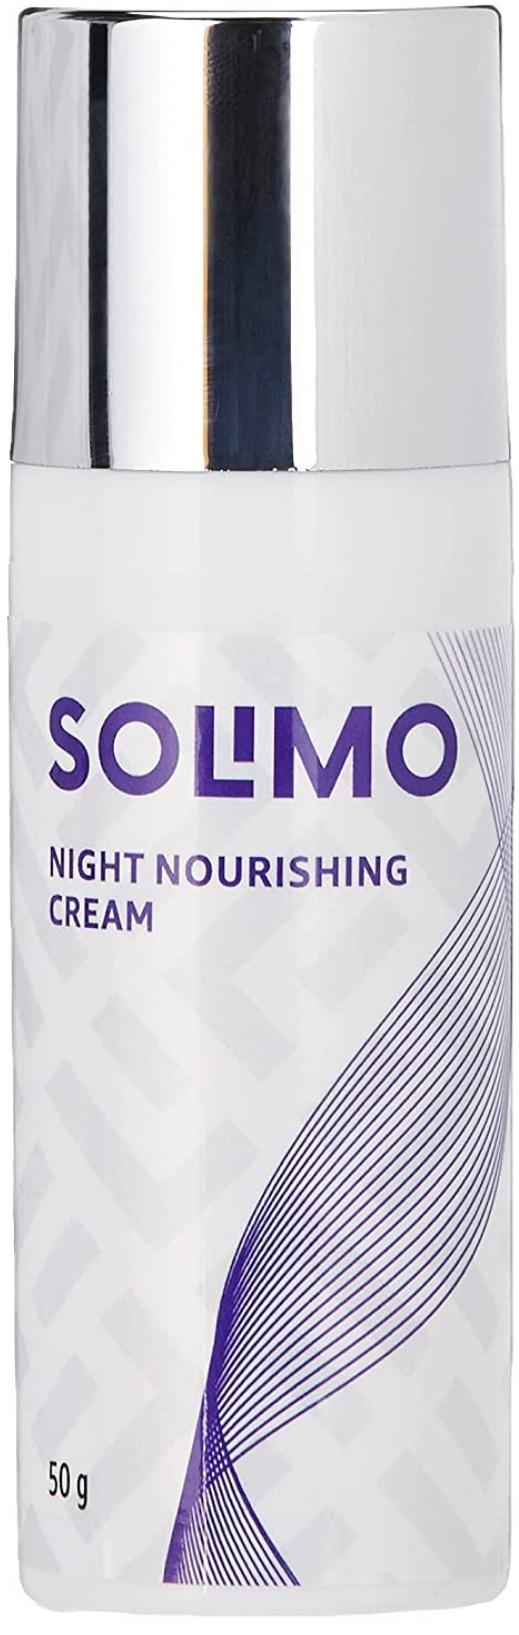 Solimo Night Nourishing Cream